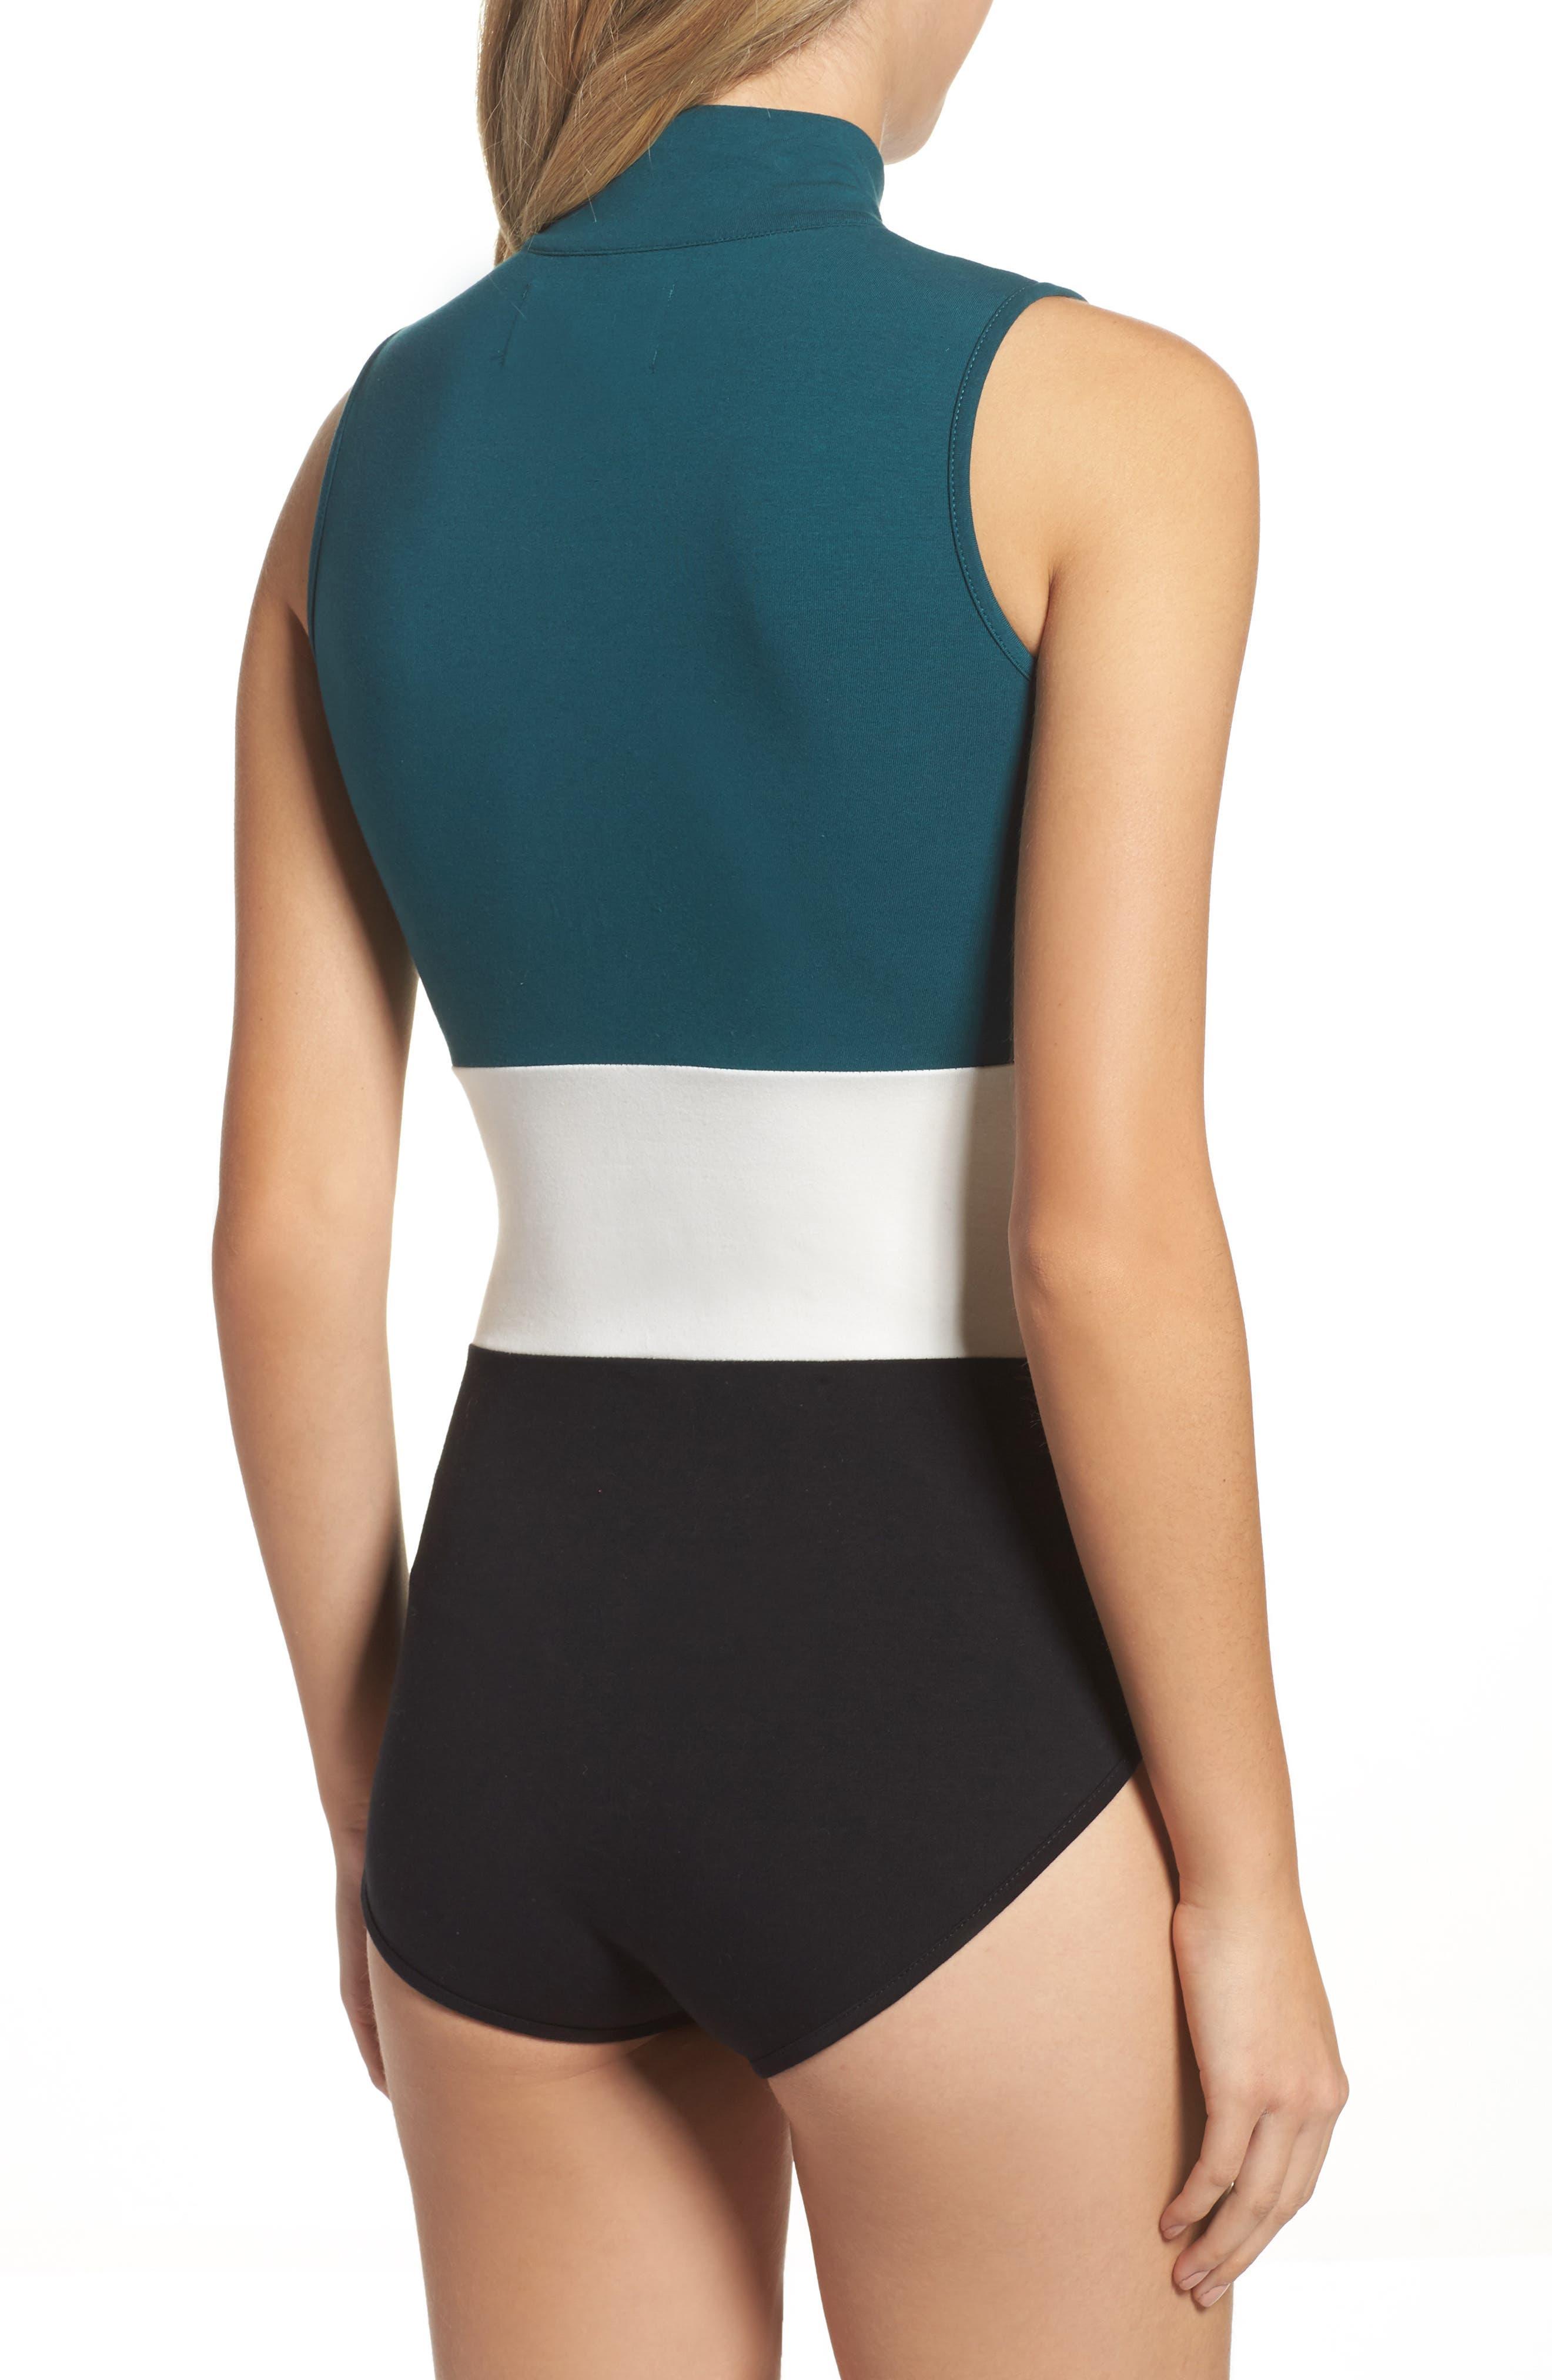 Bianca Bodysuit,                             Alternate thumbnail 2, color,                             Deep Teal/ Gardenia/ Black